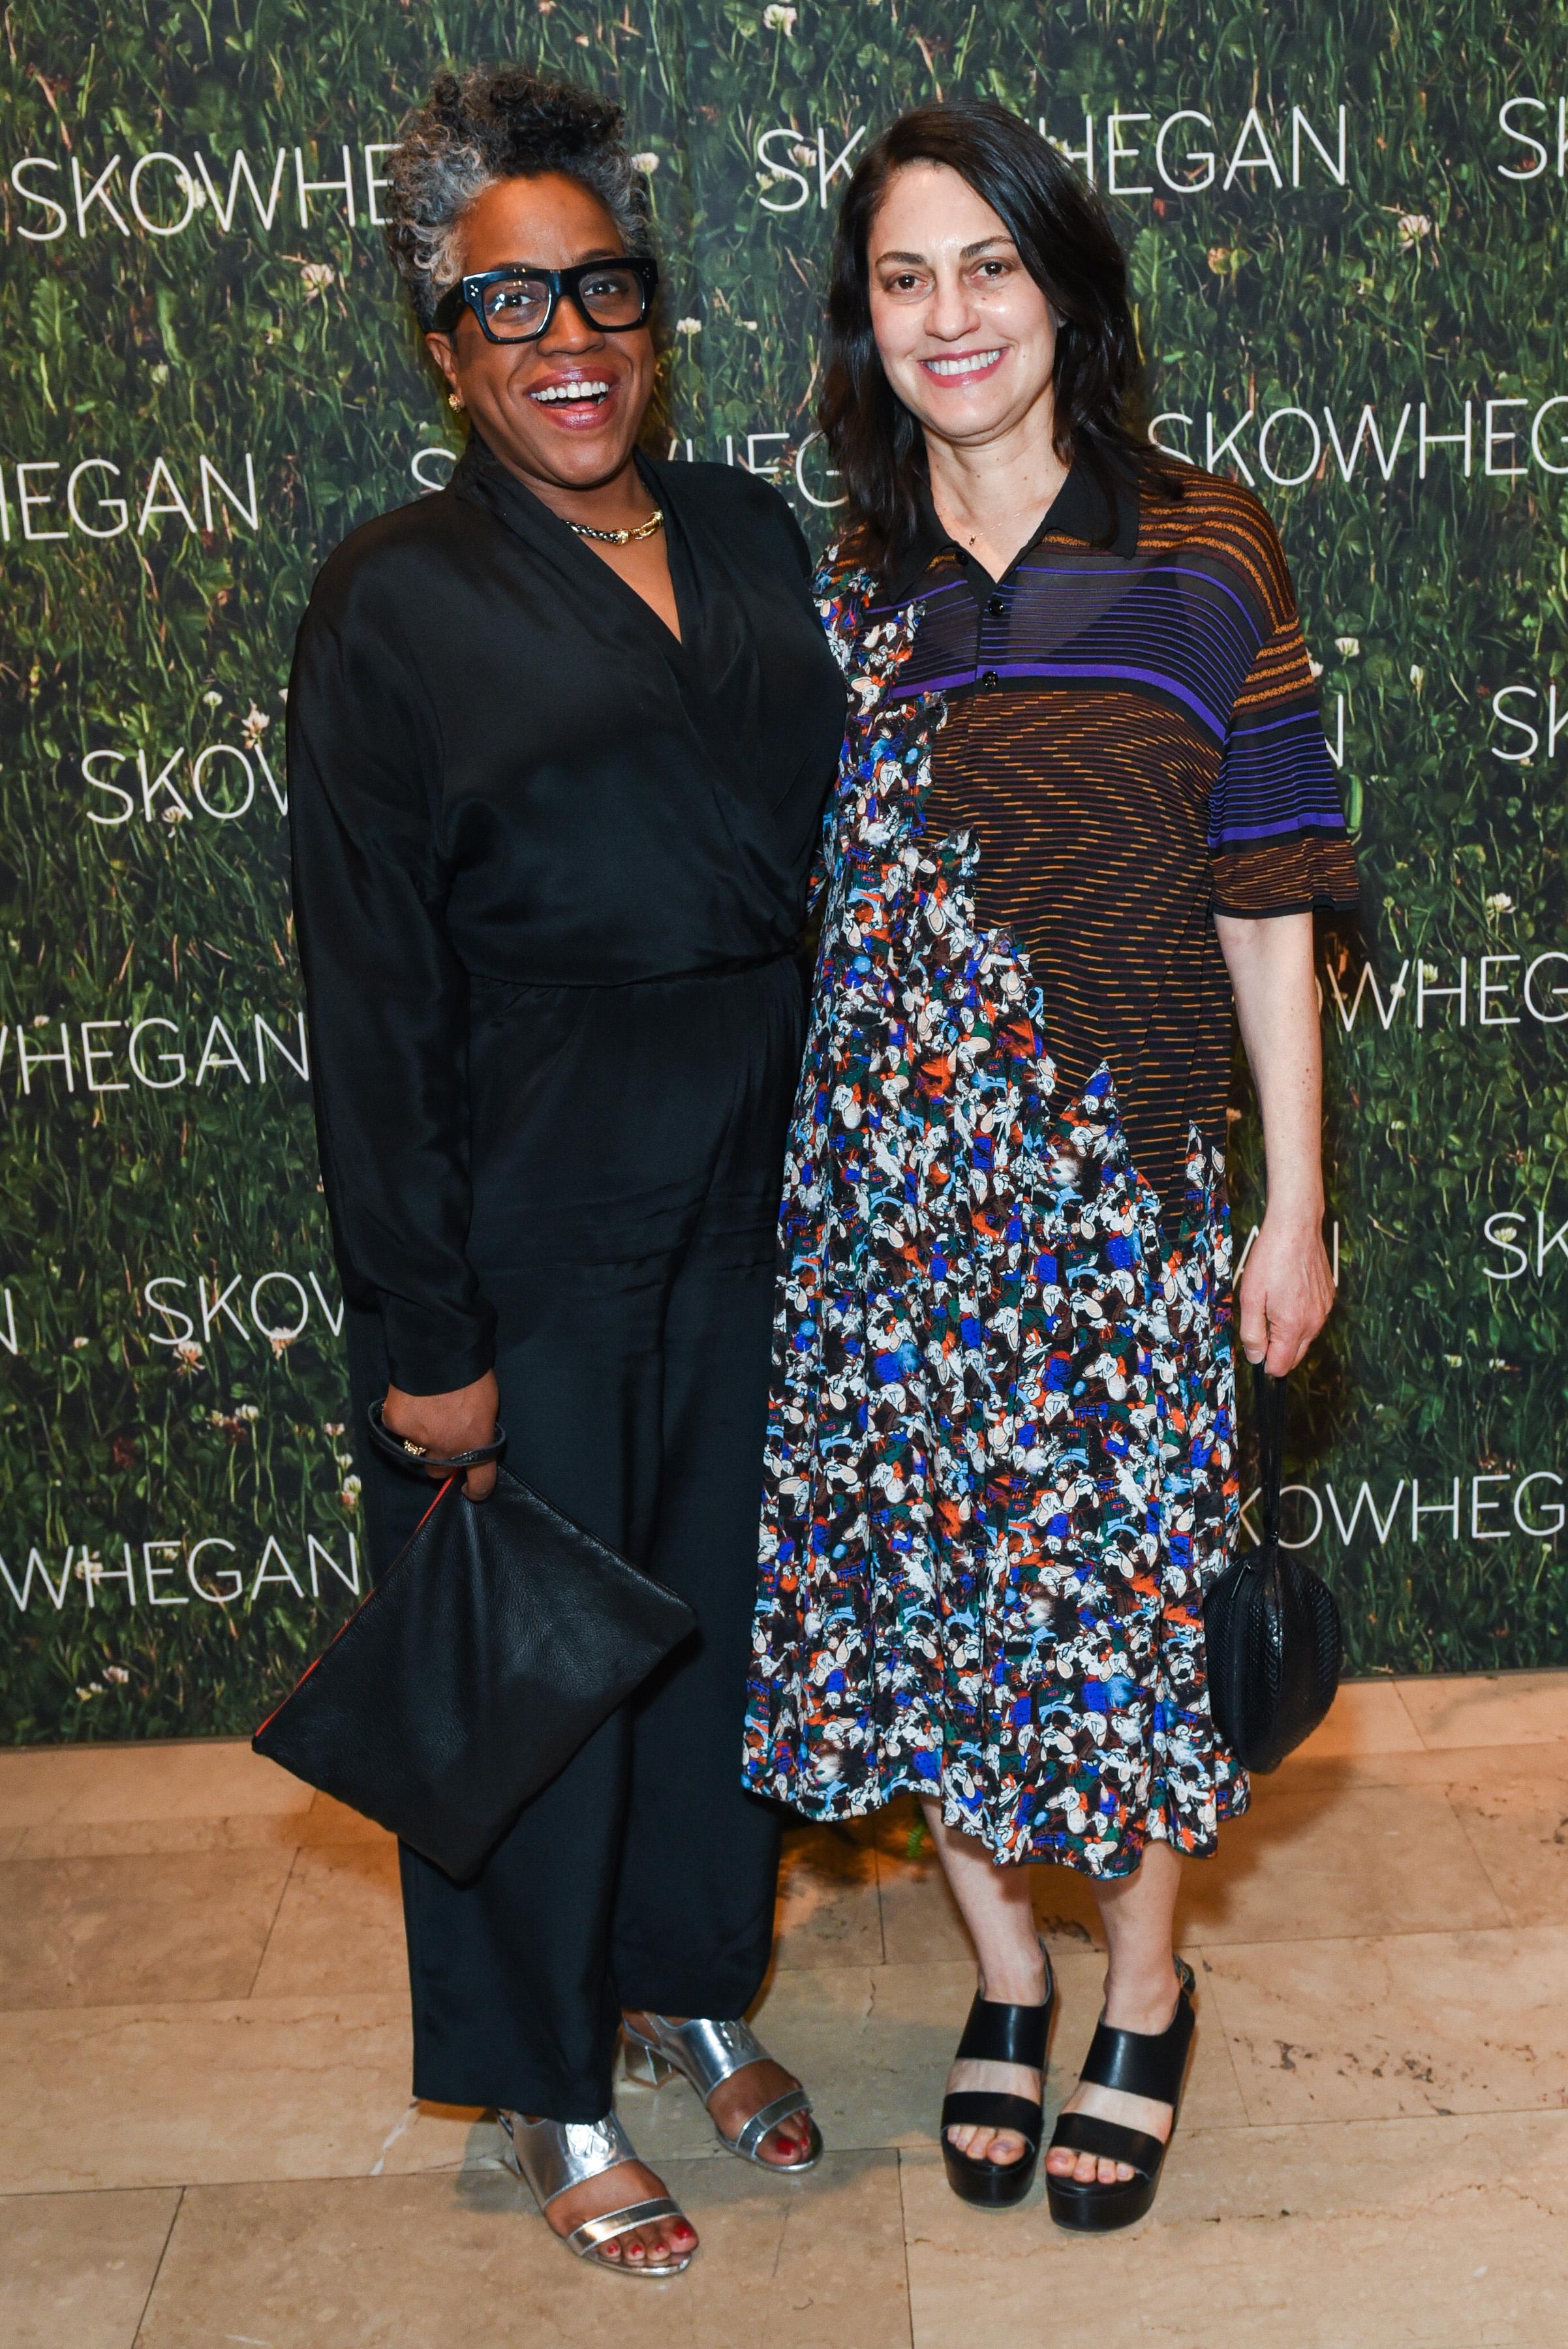 Jennie C. Jones, Alex Pearlstein==Skowhegan Awards Dinner 2018==The Plaza Hotel, New York, NY==April 24, 2018==�Patrick McMullan==Photo - Presley Ann/PMC====